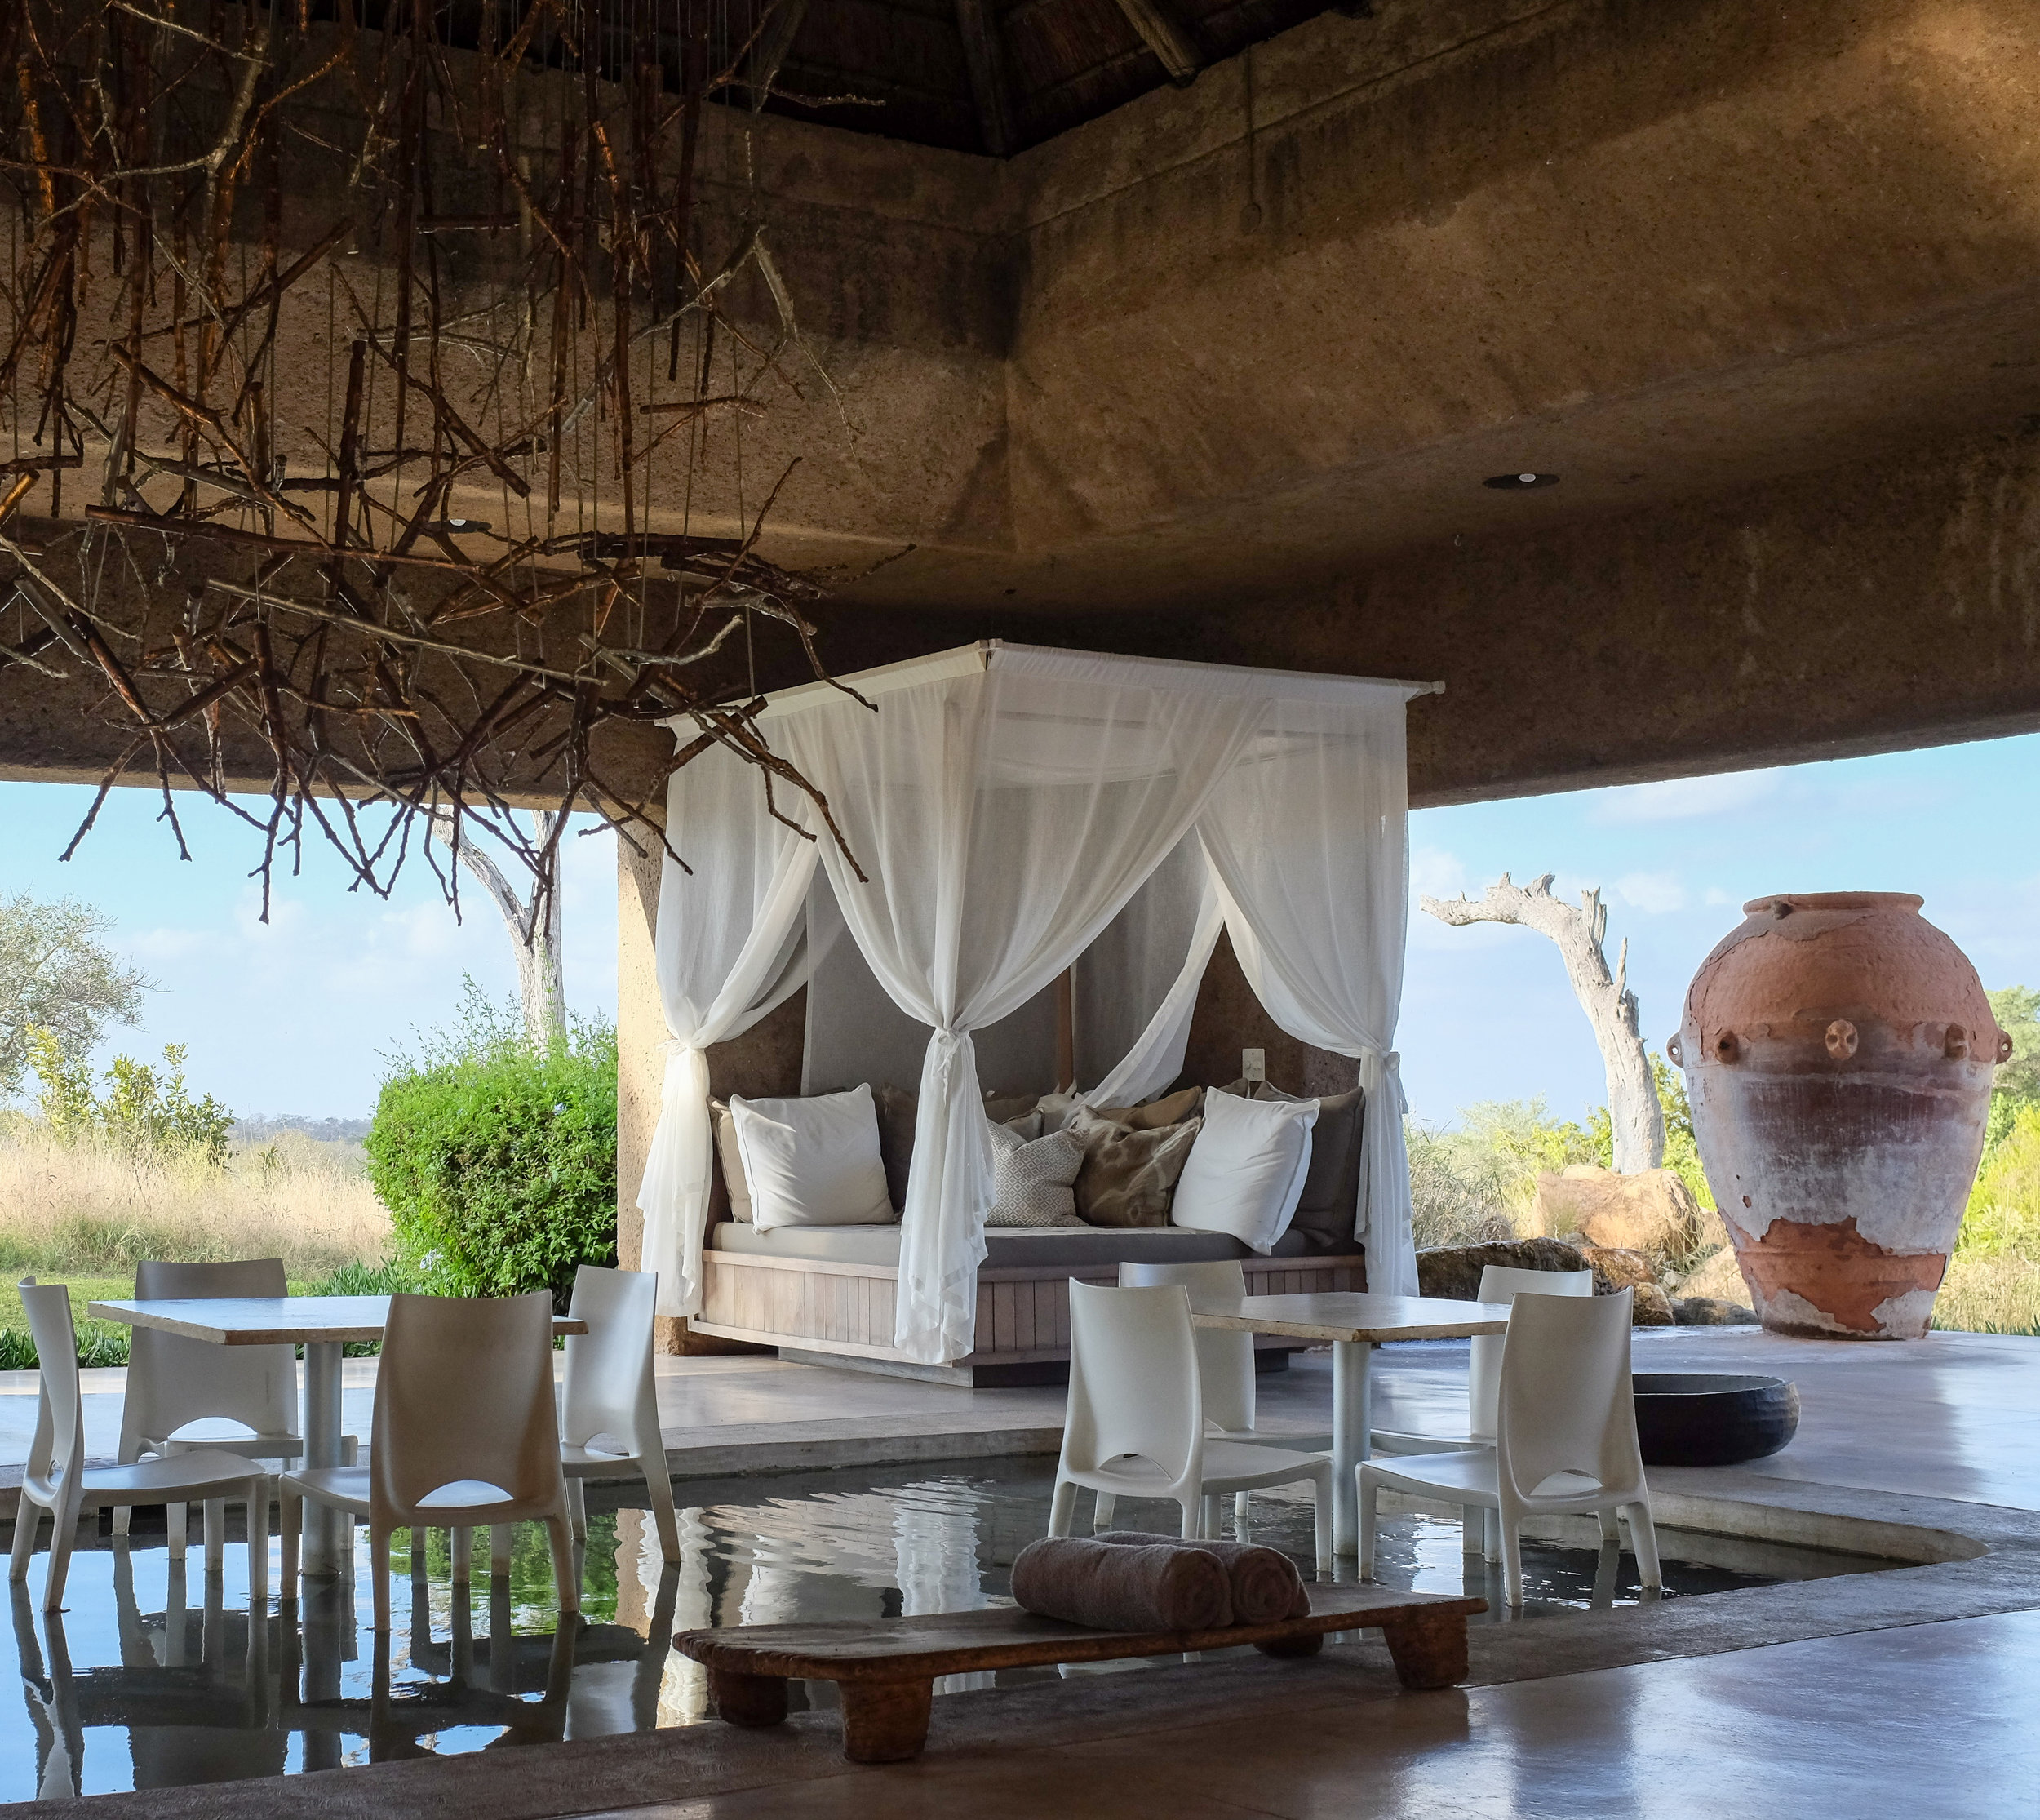 Earth Lodge / Sabi Sabi / South Africa